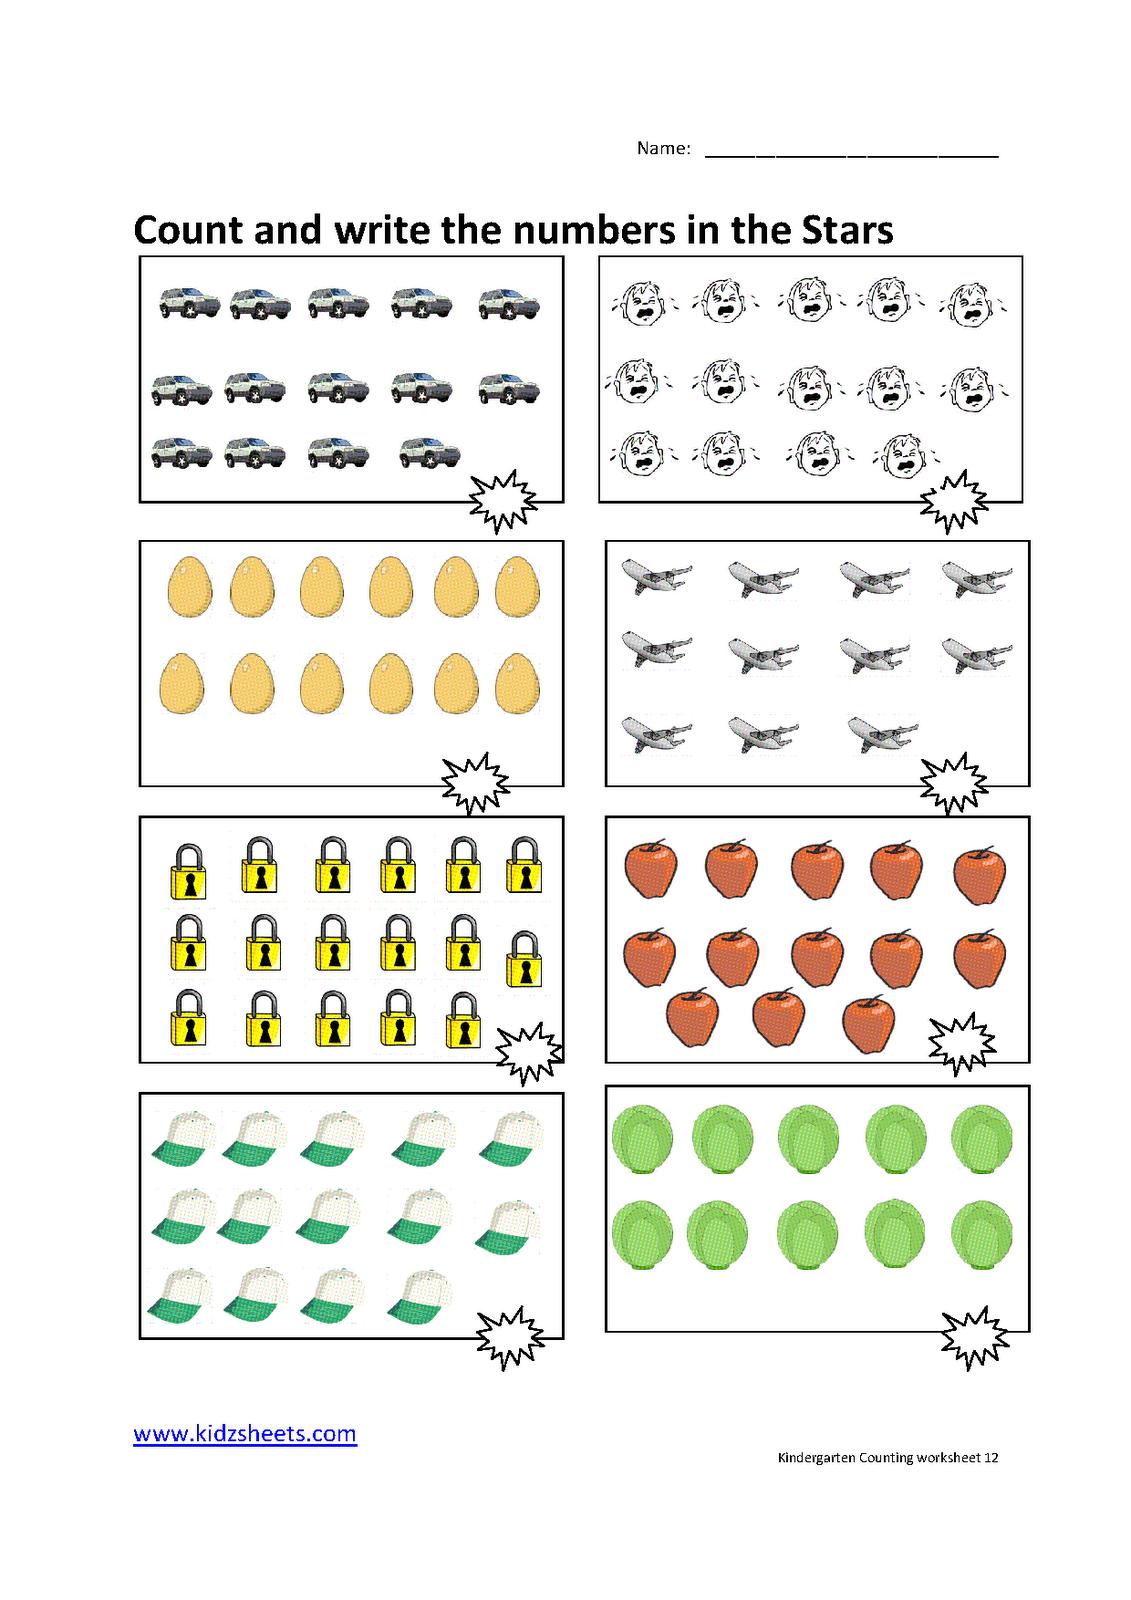 Kidz Worksheets: Kindergarten Counting Worksheet12